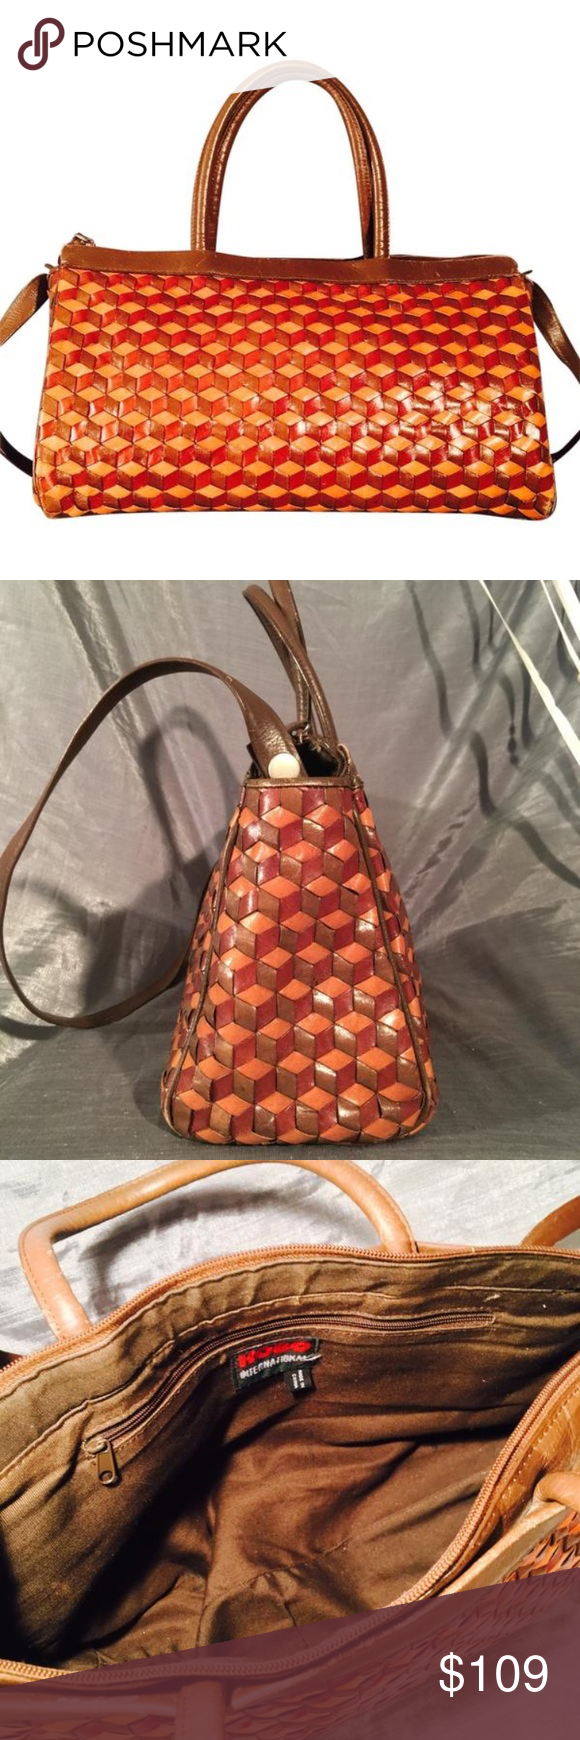 HOBO international vintage woven leather satchel Stunning rare ...